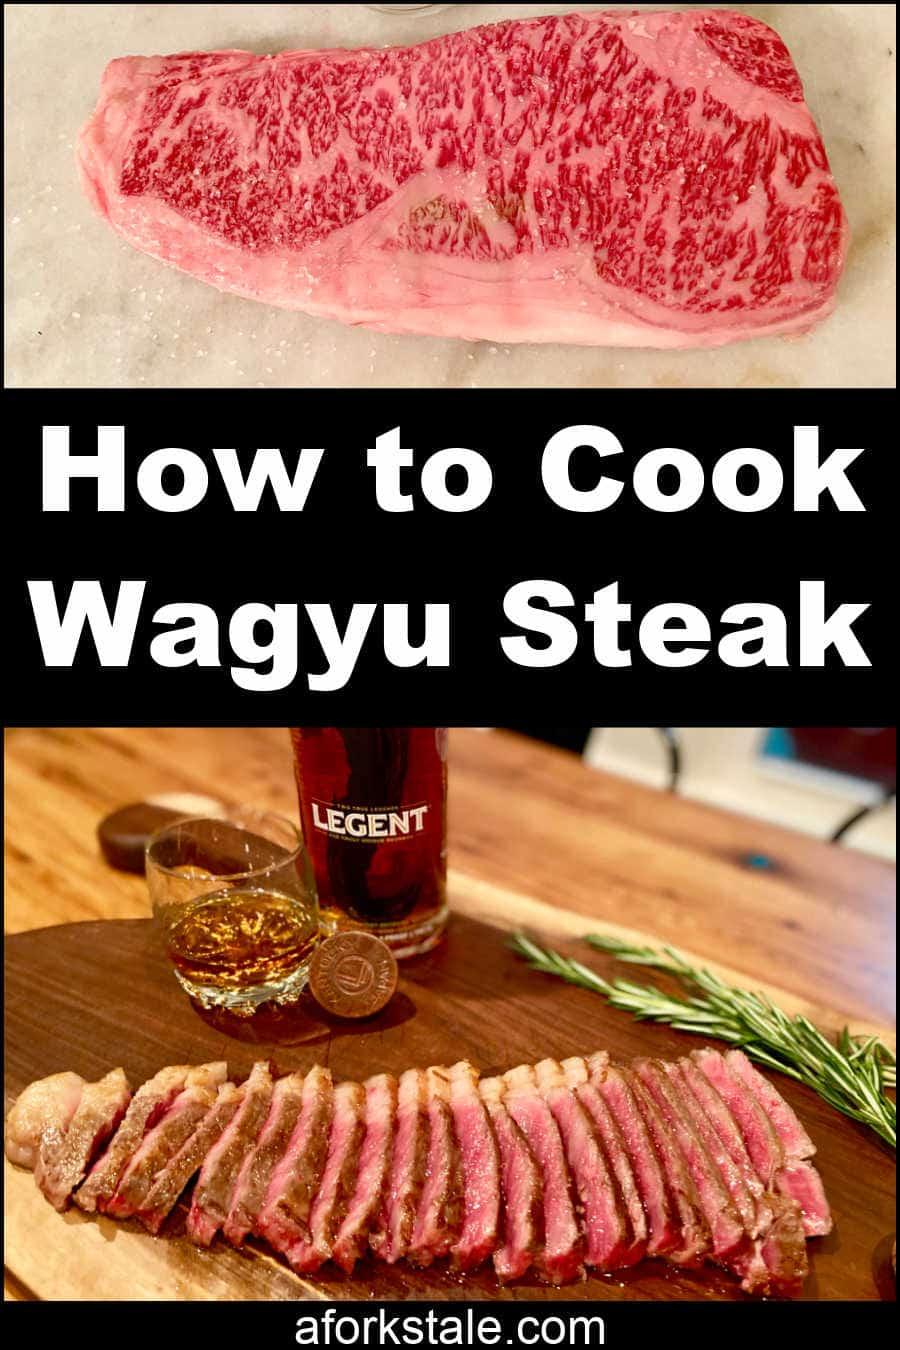 How To Cook A Wagyu Steak Recipe In 2021 Wagyu Steak Cooking Wagyu